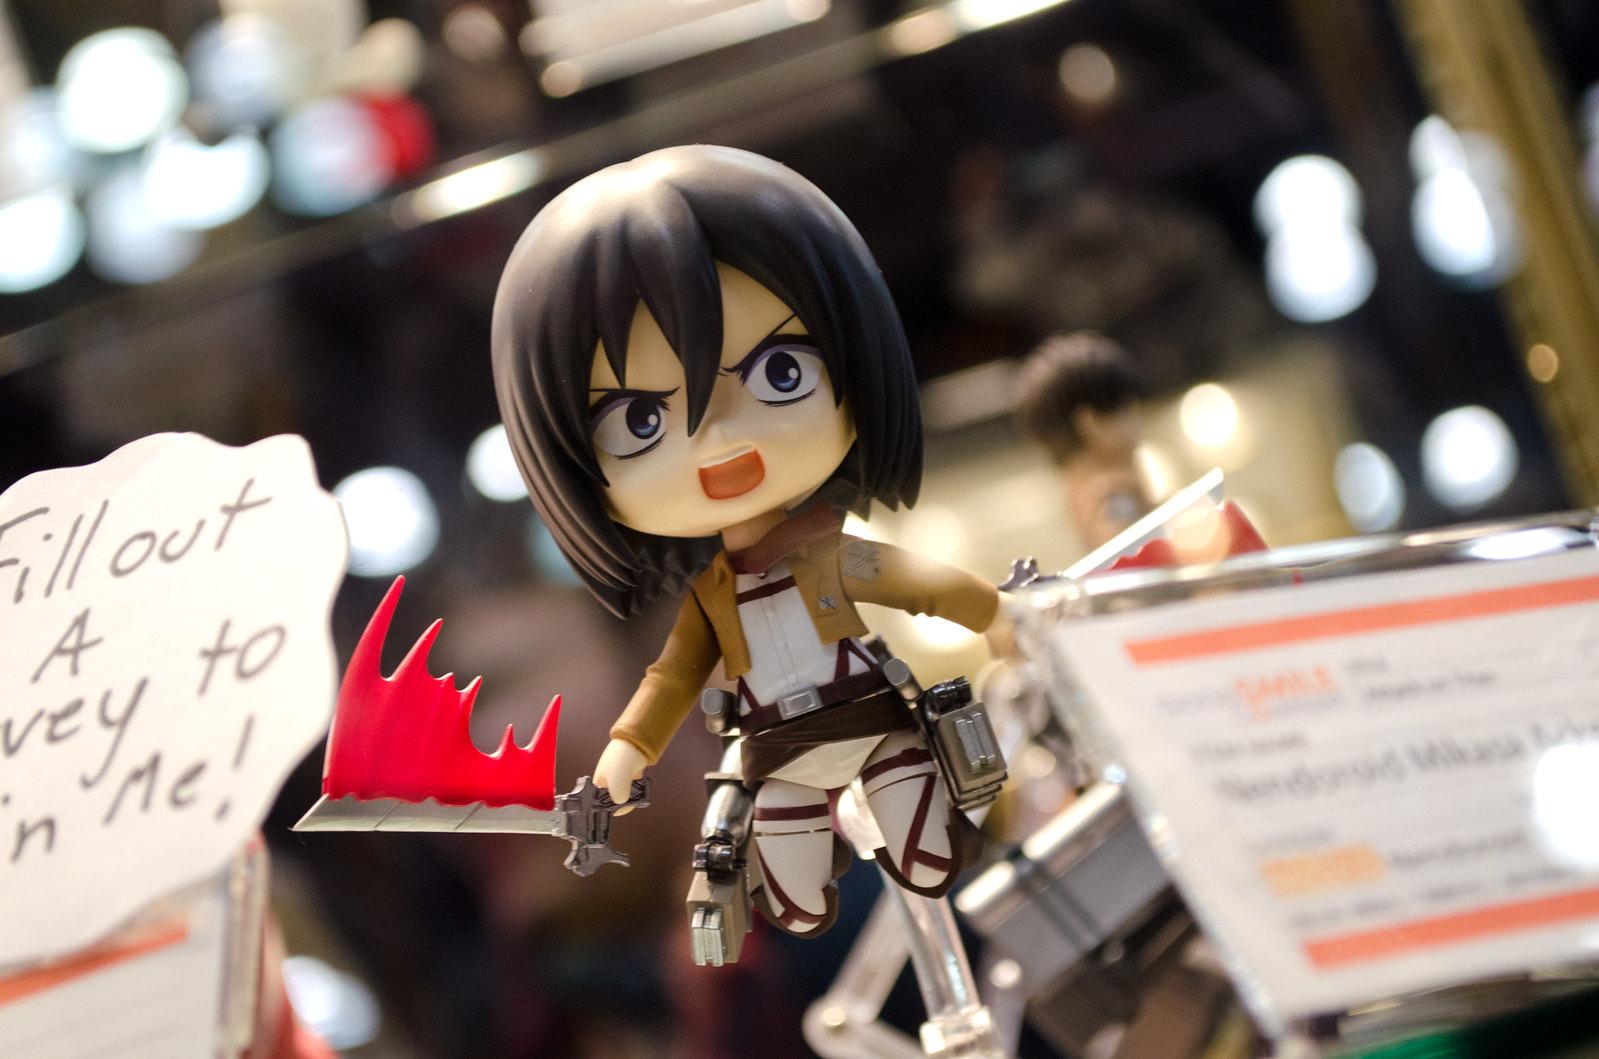 Mikasa Nendoroid